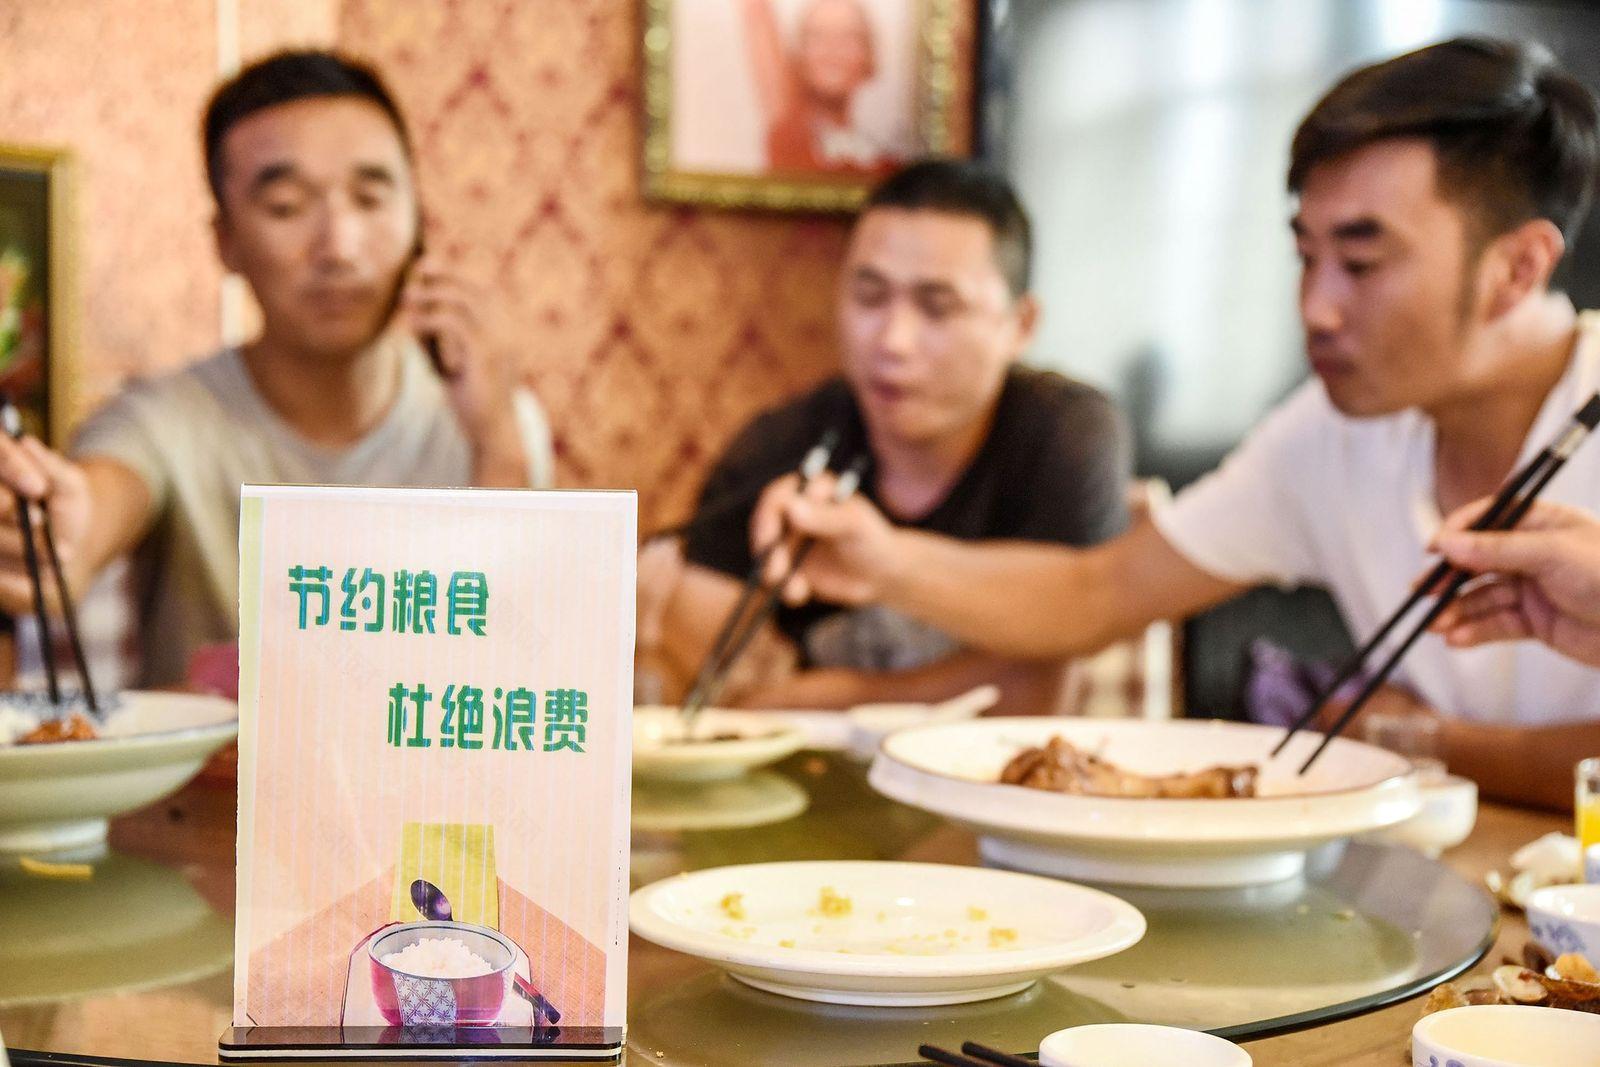 CHINA-ECONOMY-FOOD